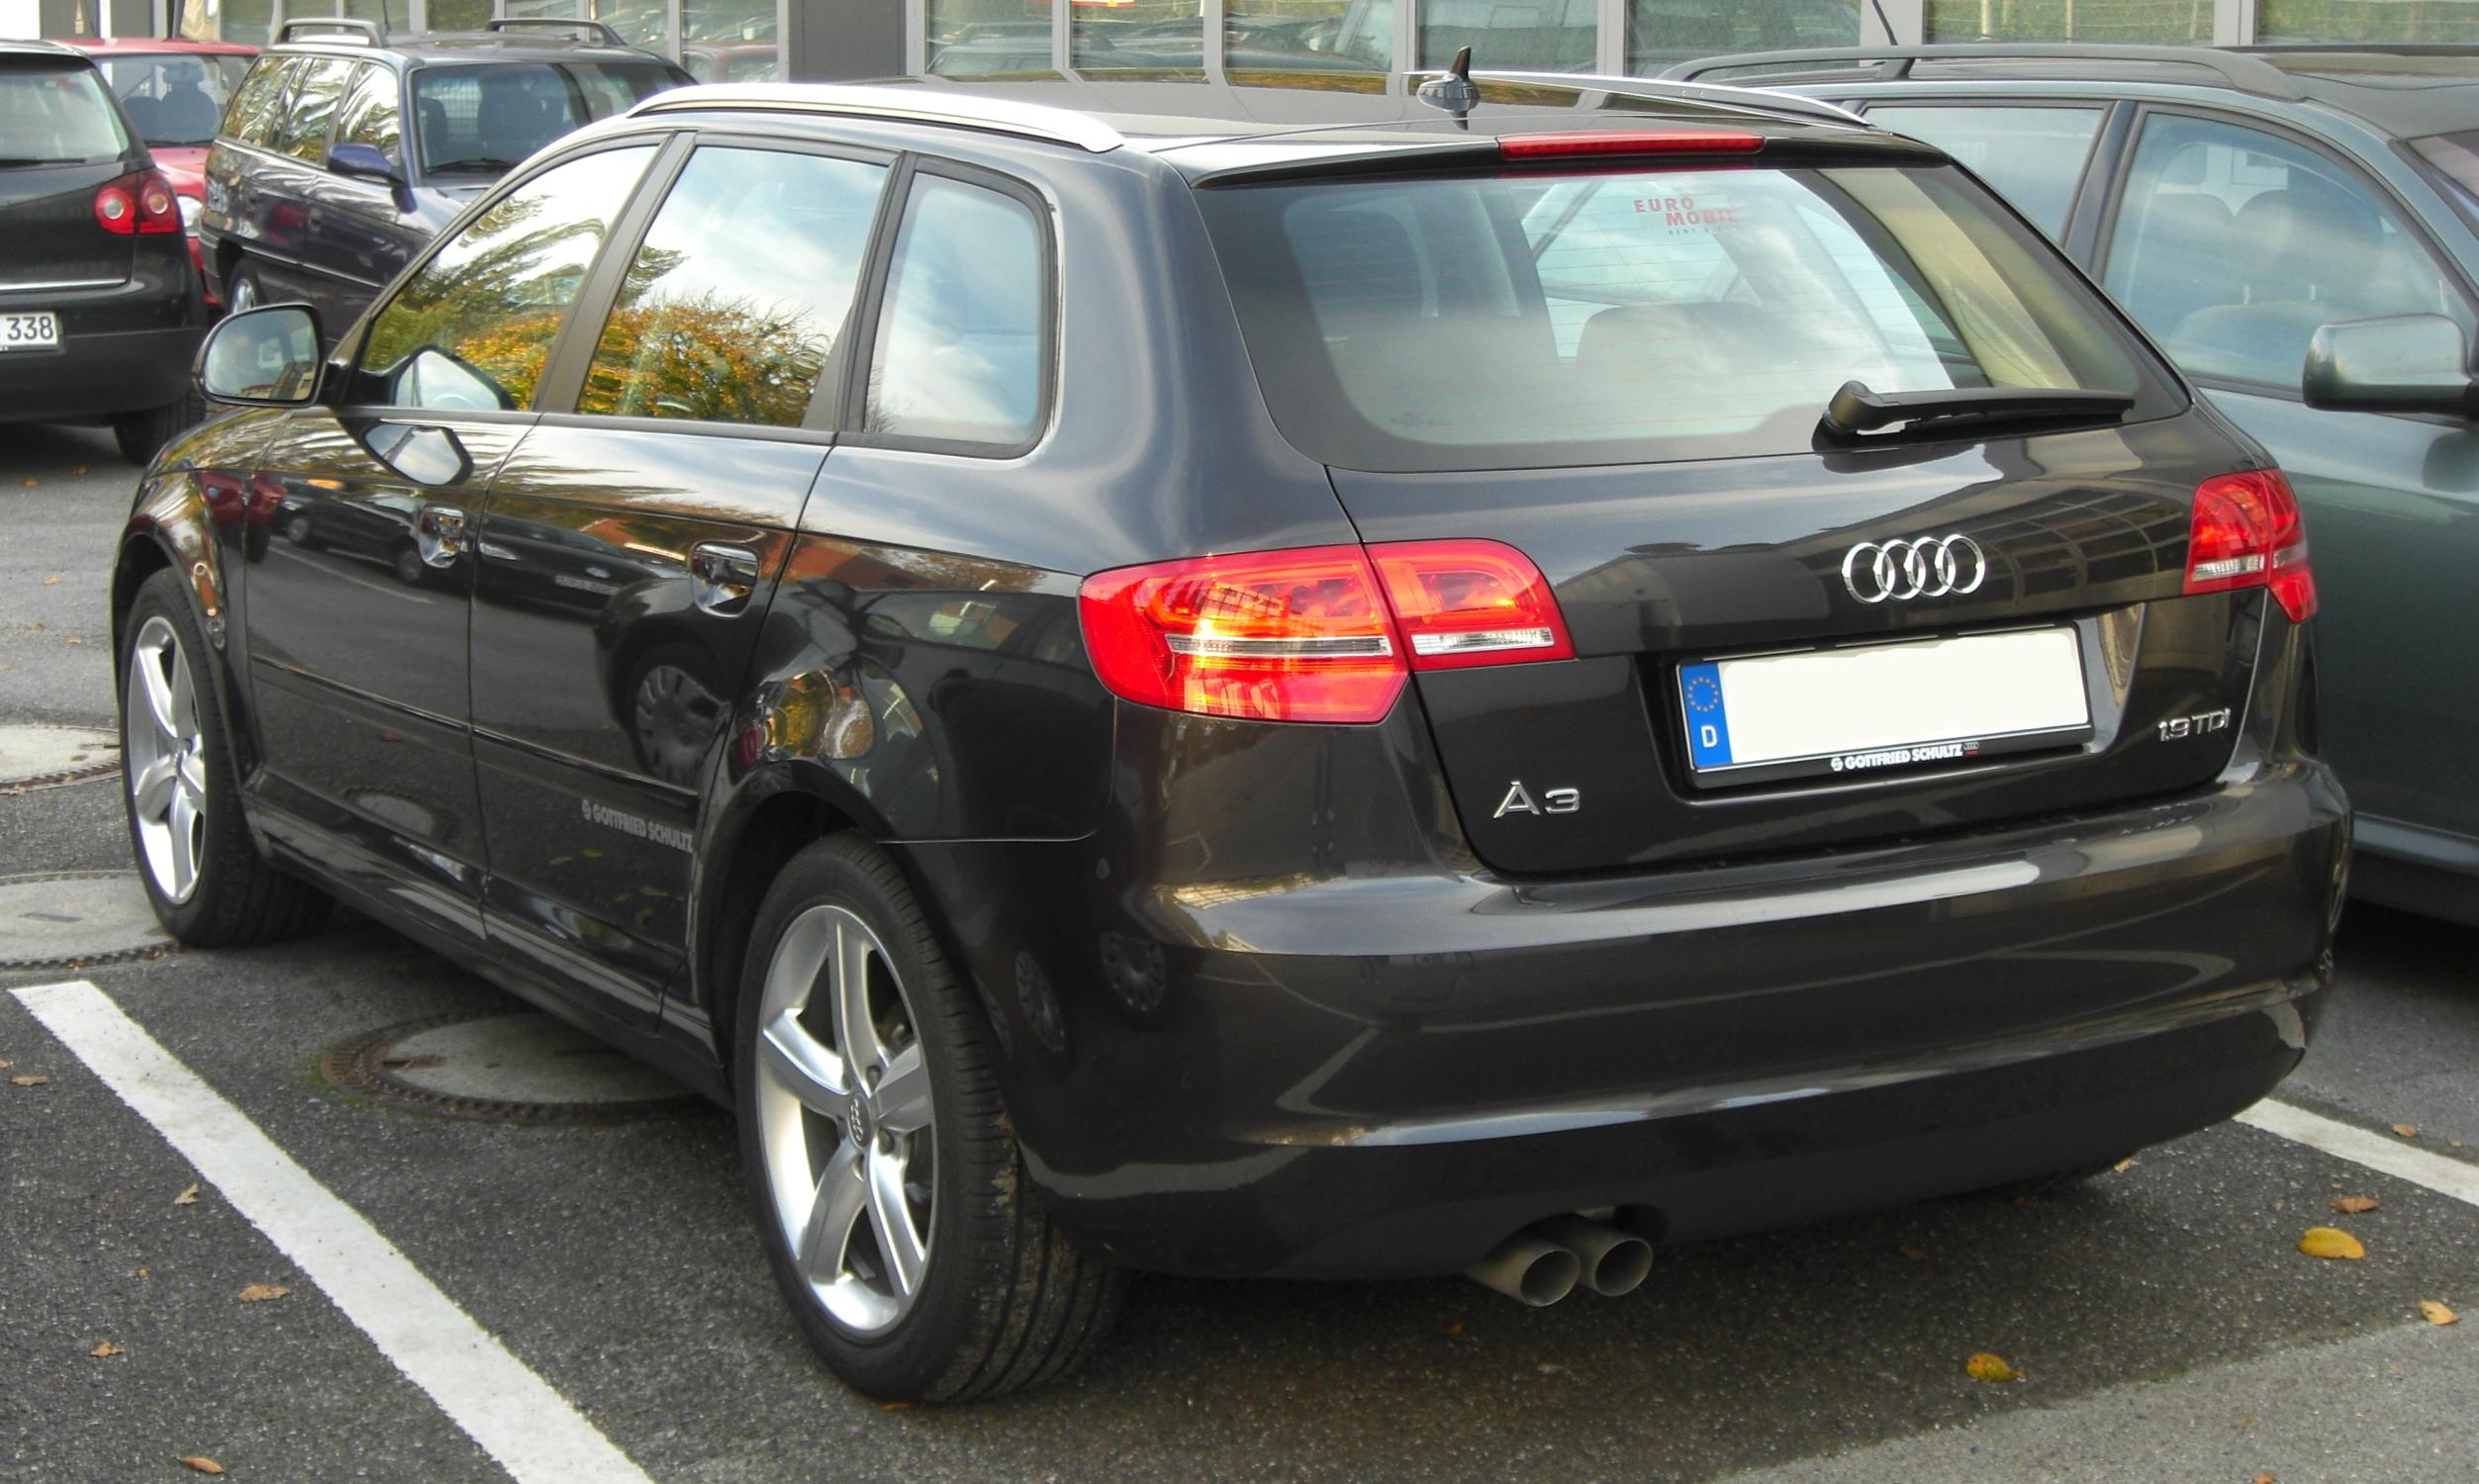 Audi A3 Sportback 19 TDI technical details history photos on